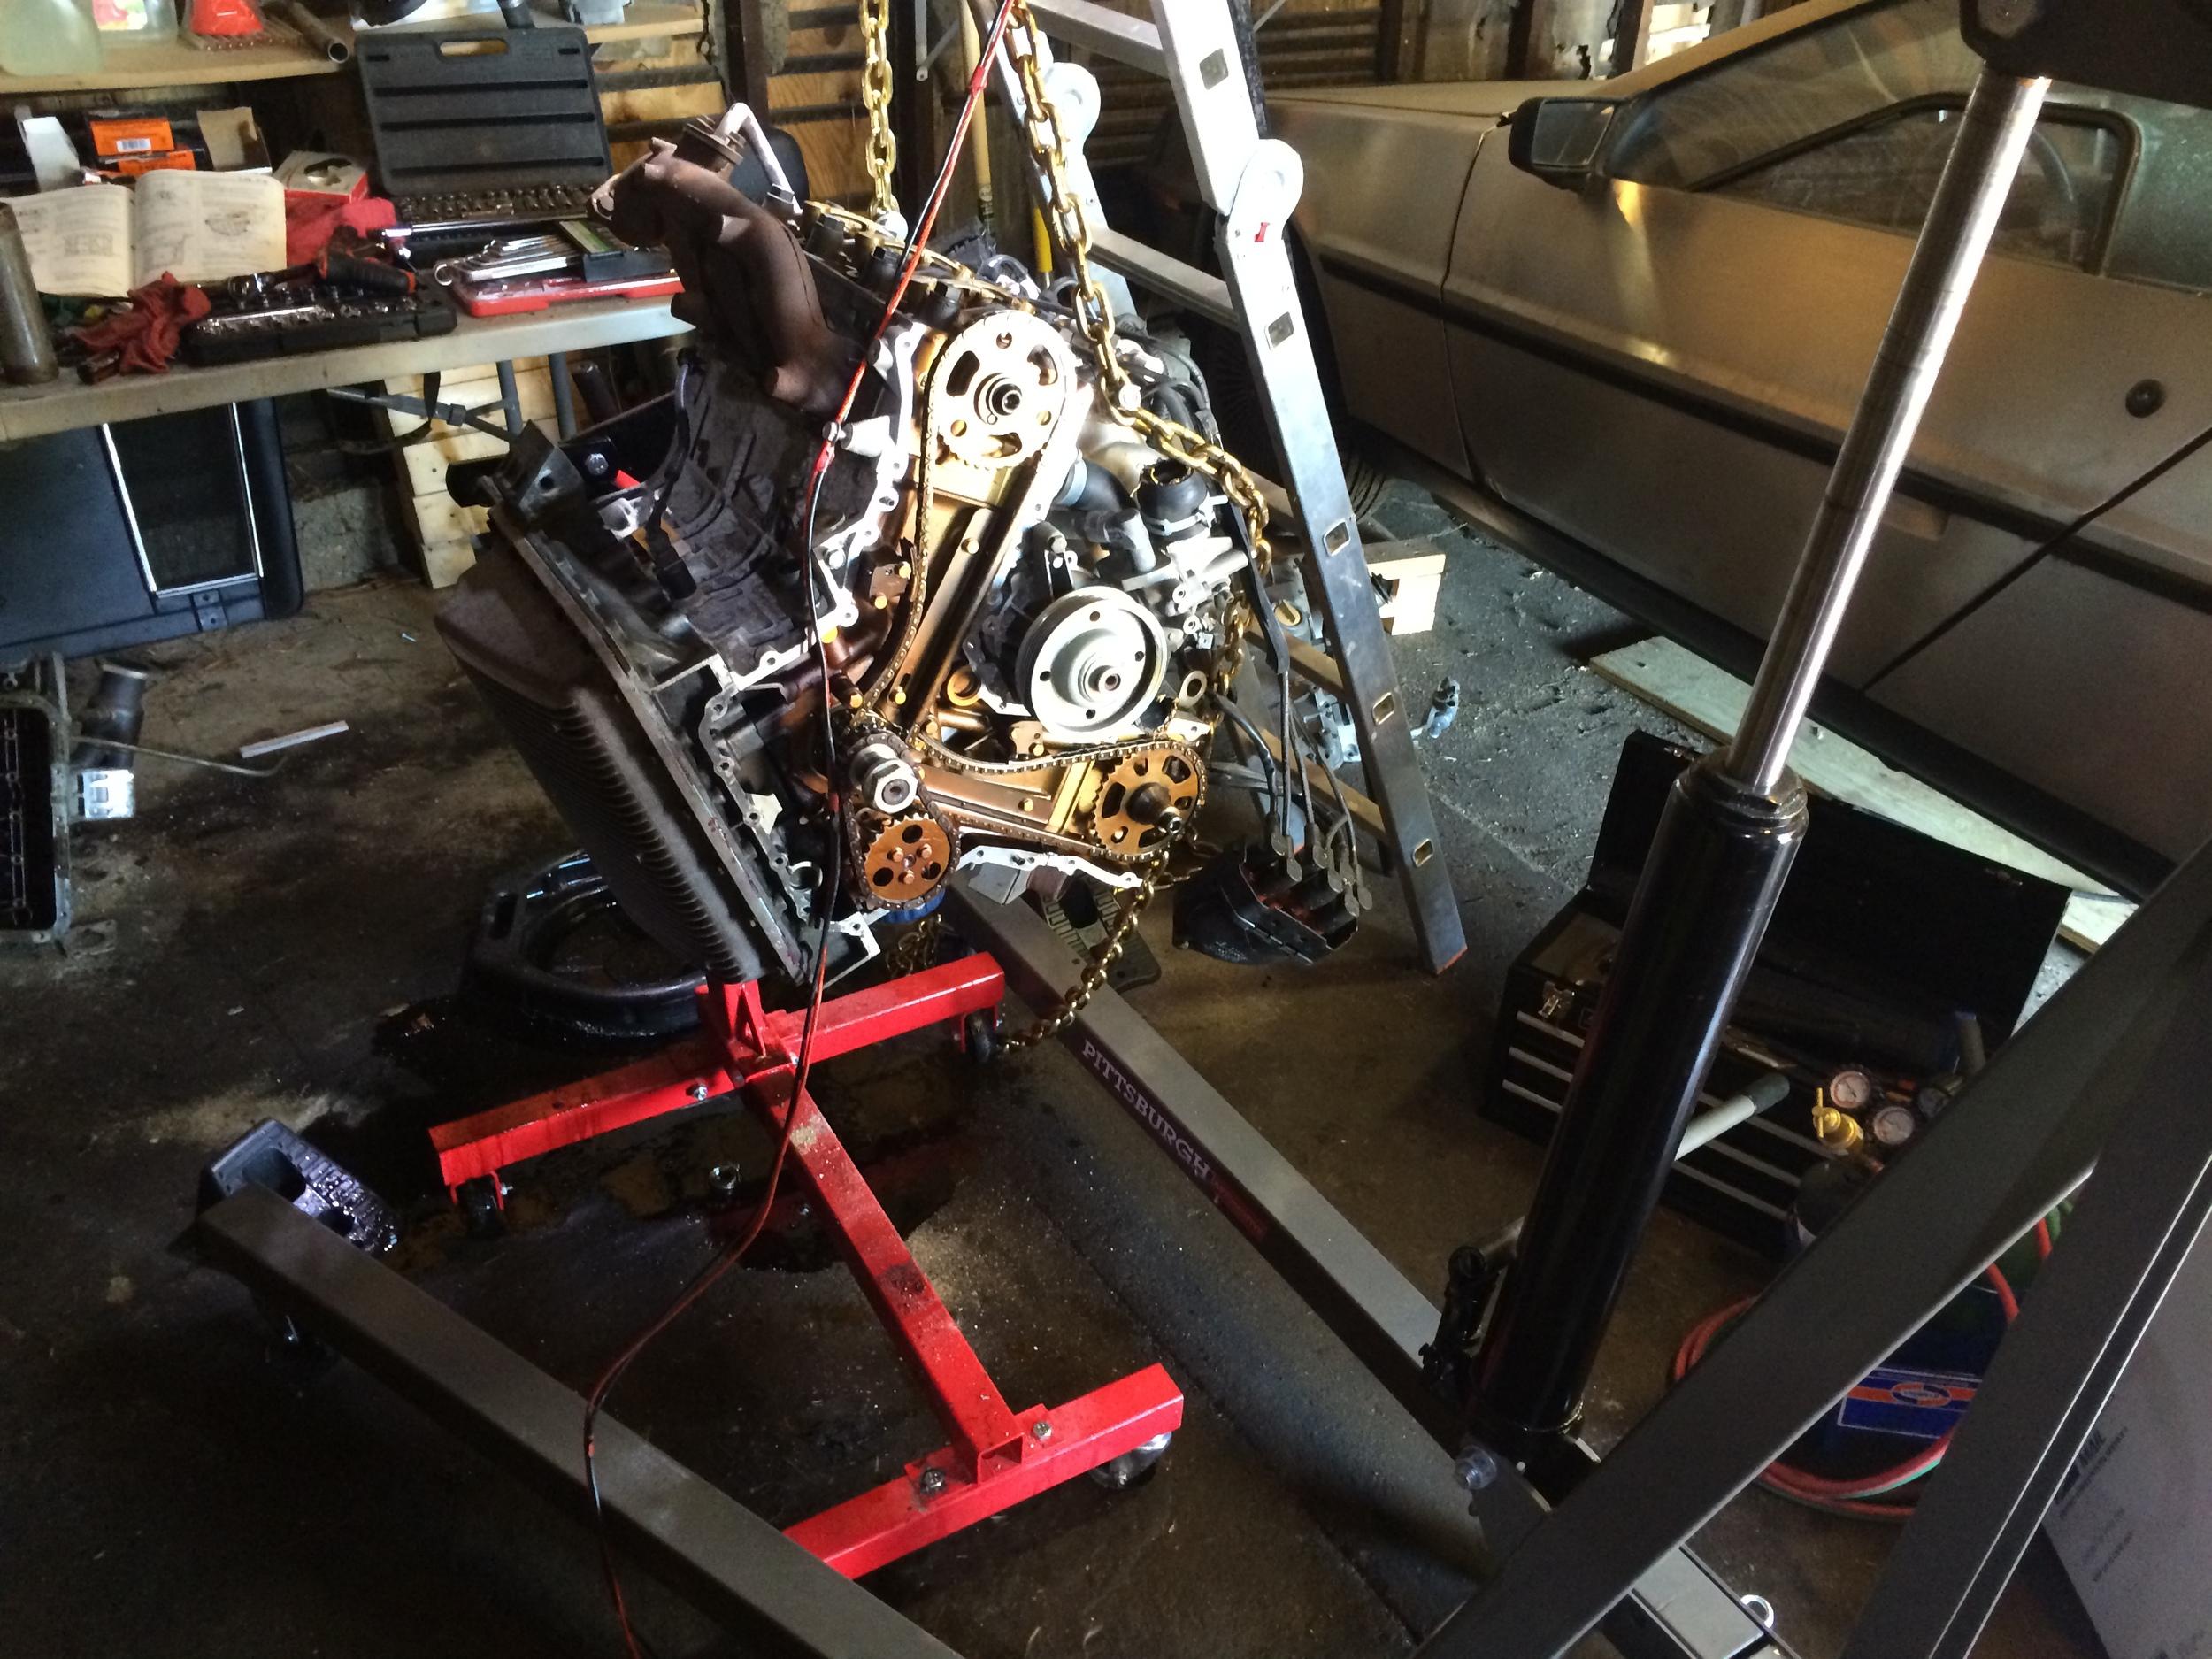 Using the engine hoist to rotate the engine.